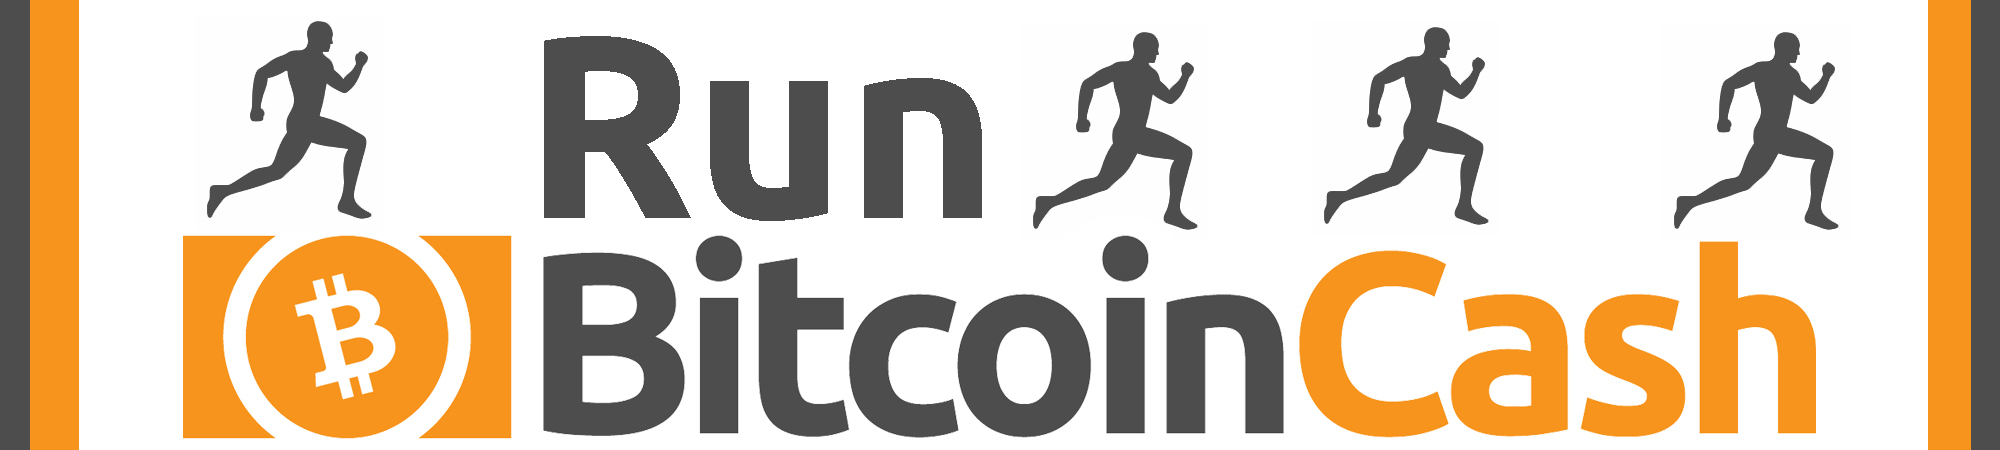 "Ejecución de Bitcoin Cash: una introducción al funcionamiento de un nodo completo ""width ="" 2000 ""height ="" 450 ""srcset ="" https://blackswanfinances.com/wp-content/uploads/2019/10/runbch.jpg 2000w, https://news.bitcoin.com/wp-content/uploads /2019/10/runbch-300x68.jpg 300w, https://news.bitcoin.com/wp-content/uploads/2019/10/runbch-768x173.jpg 768w, https://news.bitcoin.com/wp -content / uploads / 2019/10 / runbch-1024x230.jpg 1024w, https://news.bitcoin.com/wp-content/uploads/2019/10/runbch-696x157.jpg 696w, https: //news.bitcoin .com / wp-content / uploads / 2019/10 / runbch-1392x313.jpg 1392w, https://news.bitcoin.com/wp-content/uploads/2019/10/runbch-1068x240.jpg 1068w ""tamaños ="" (ancho máximo: 2000px) 100vw, 2000px"